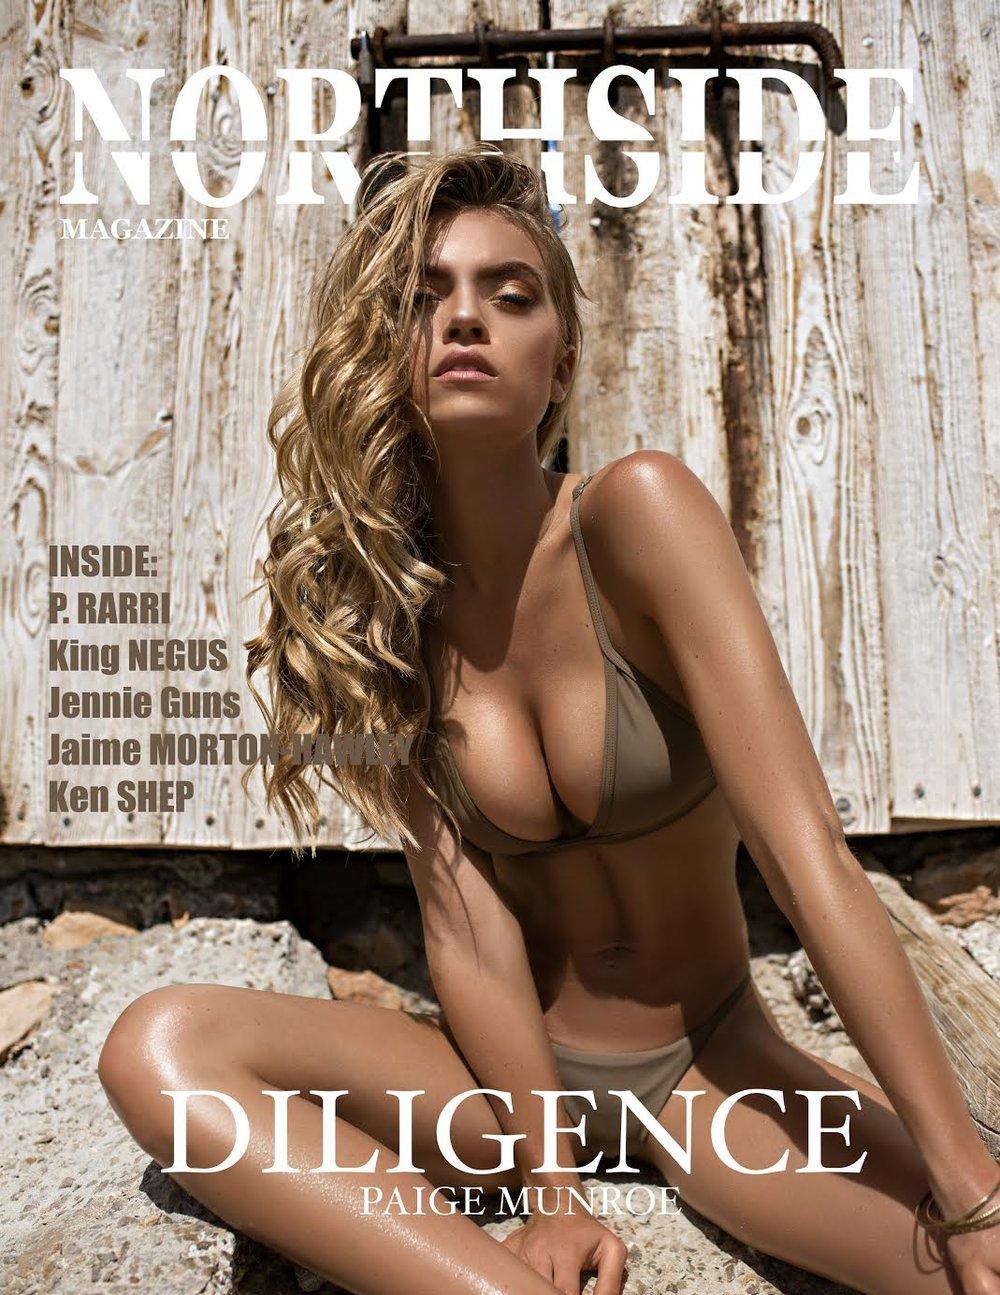 Northside Magazine Vol 20 Paige Munroe